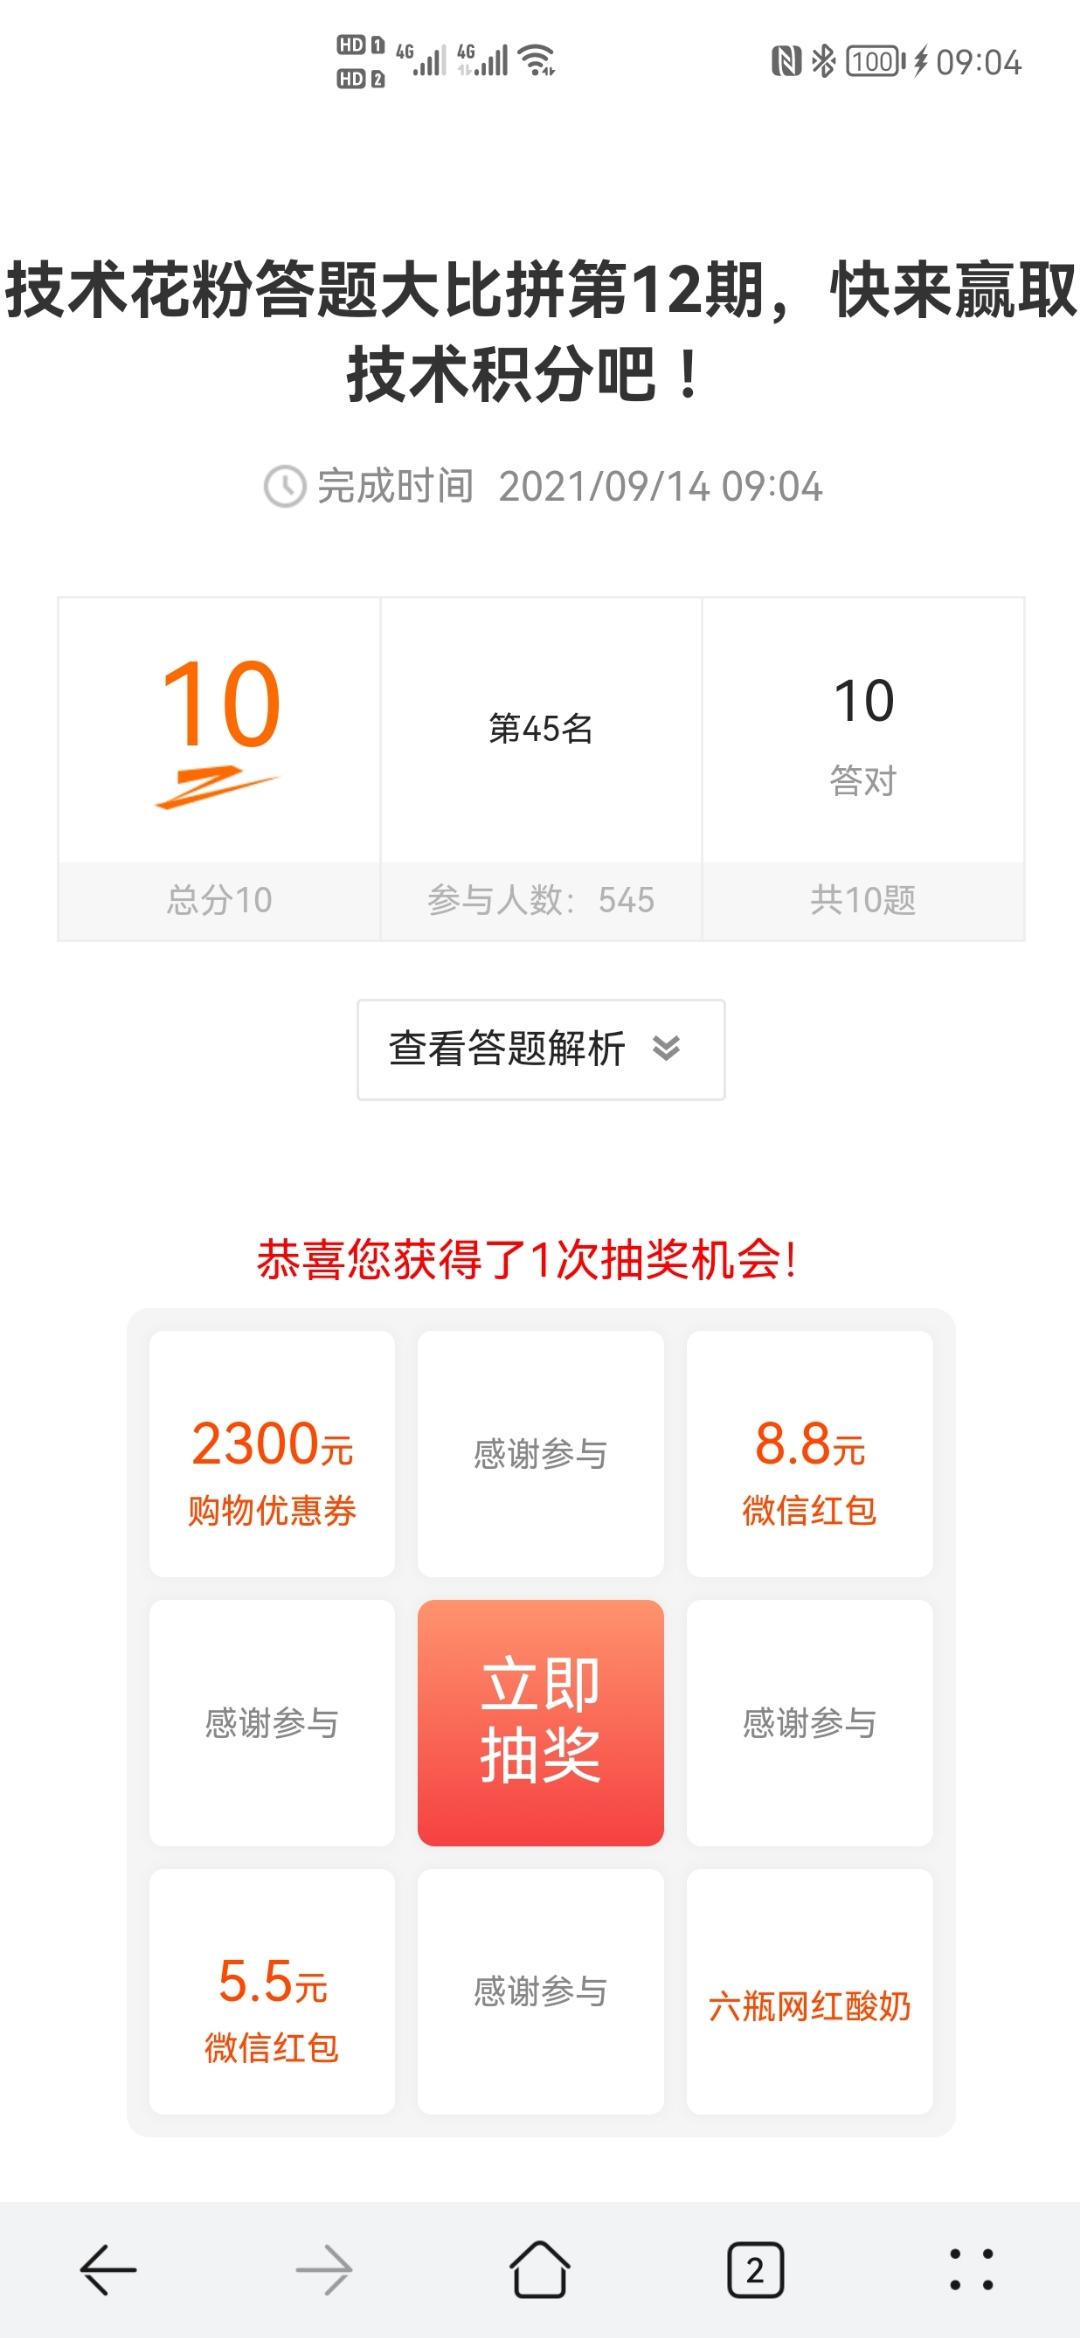 Screenshot_20210914_090431_com.huawei.browser.jpg